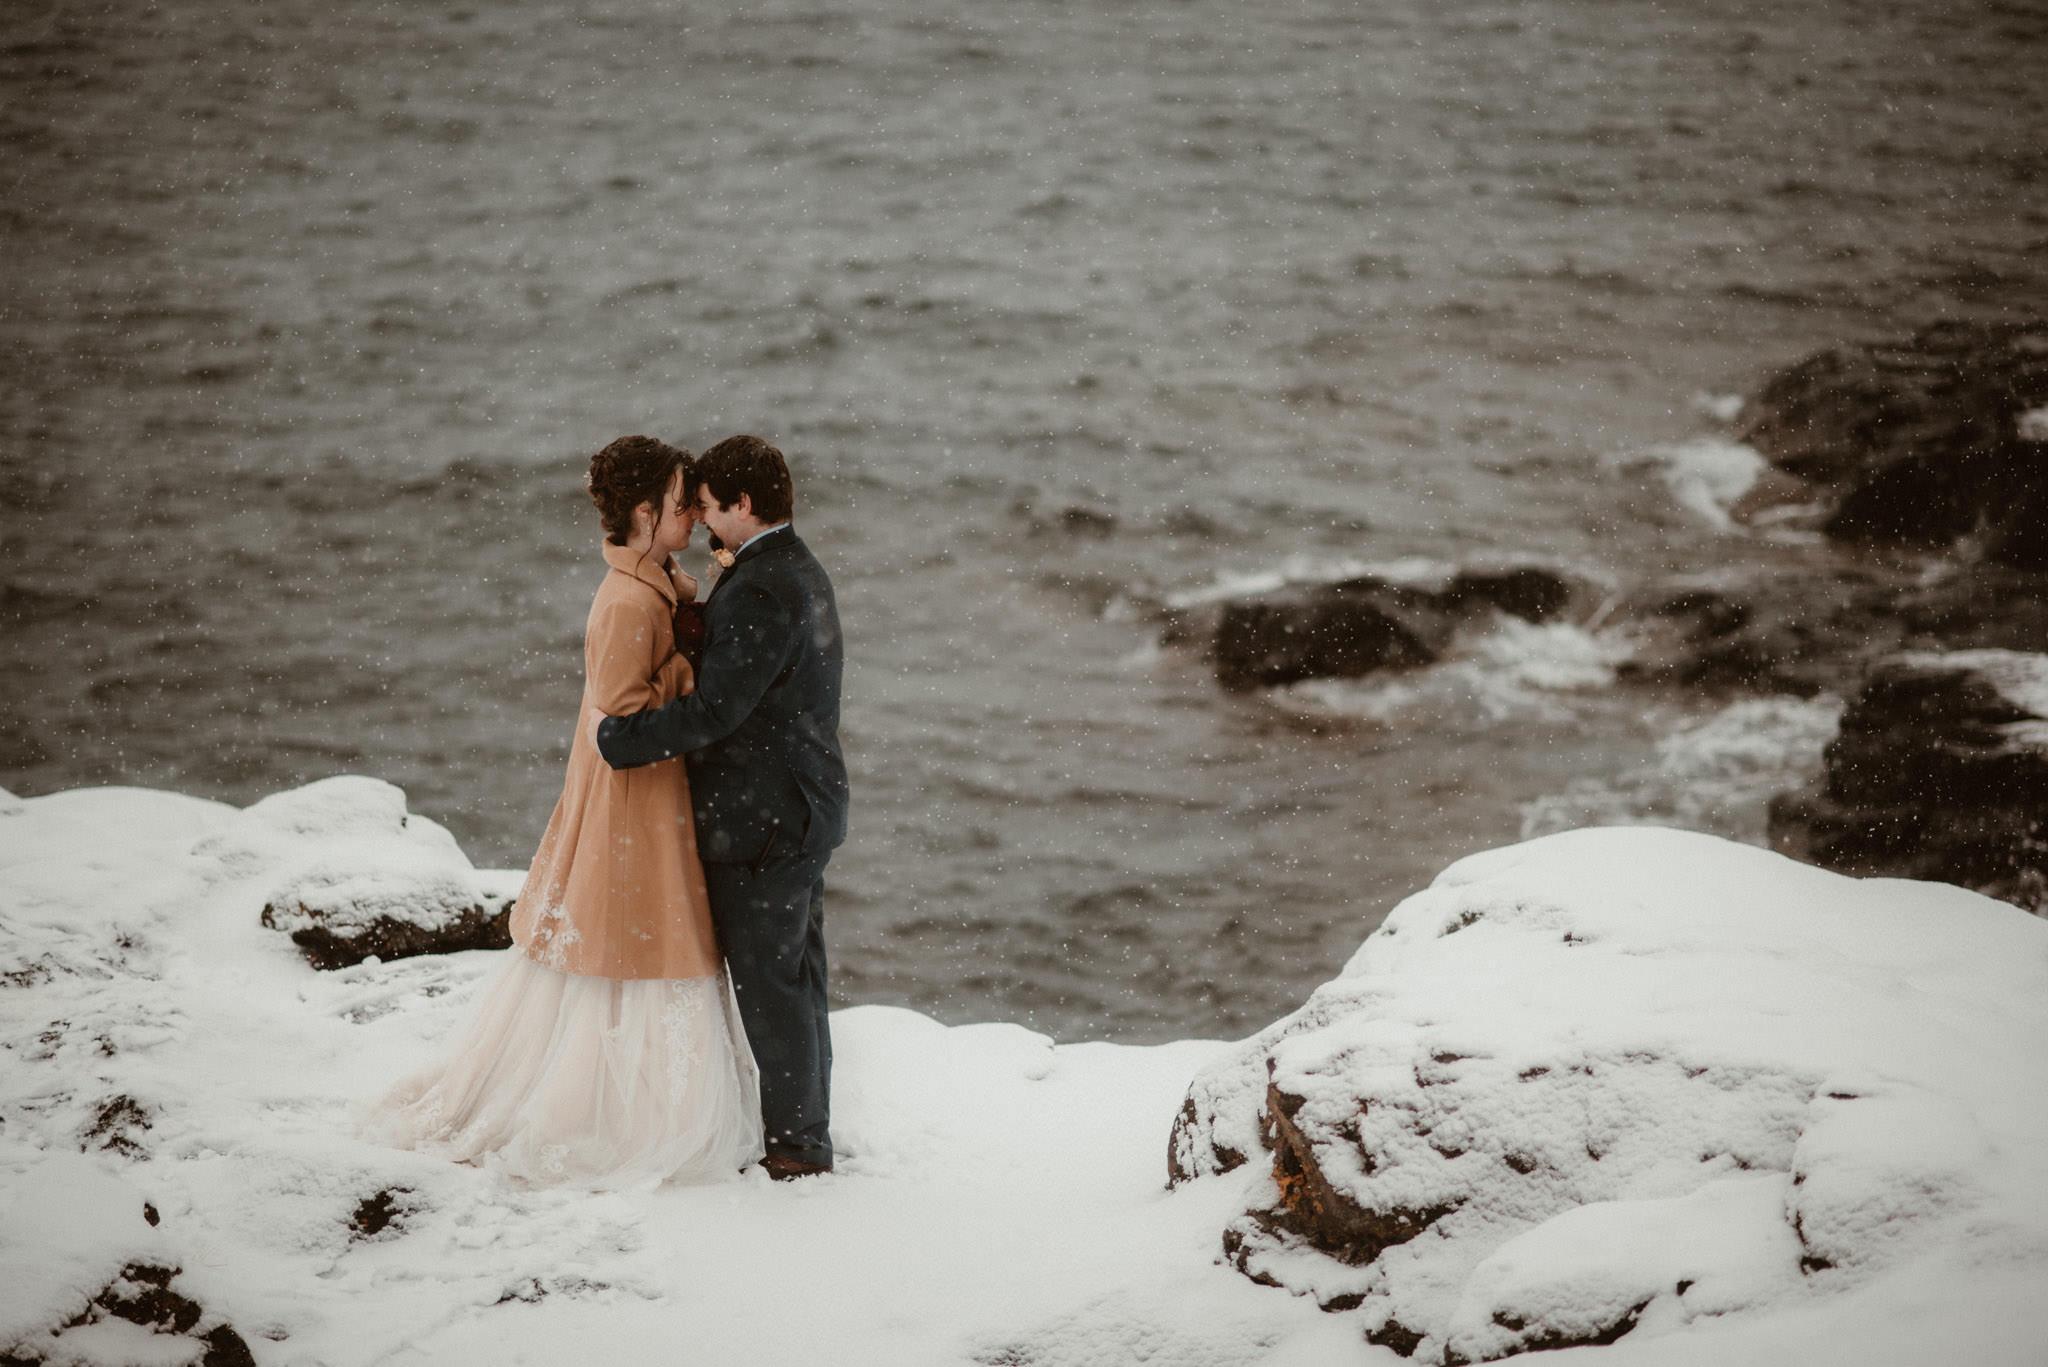 Elopement in winter on Lake Superior, Marquette, Michigan